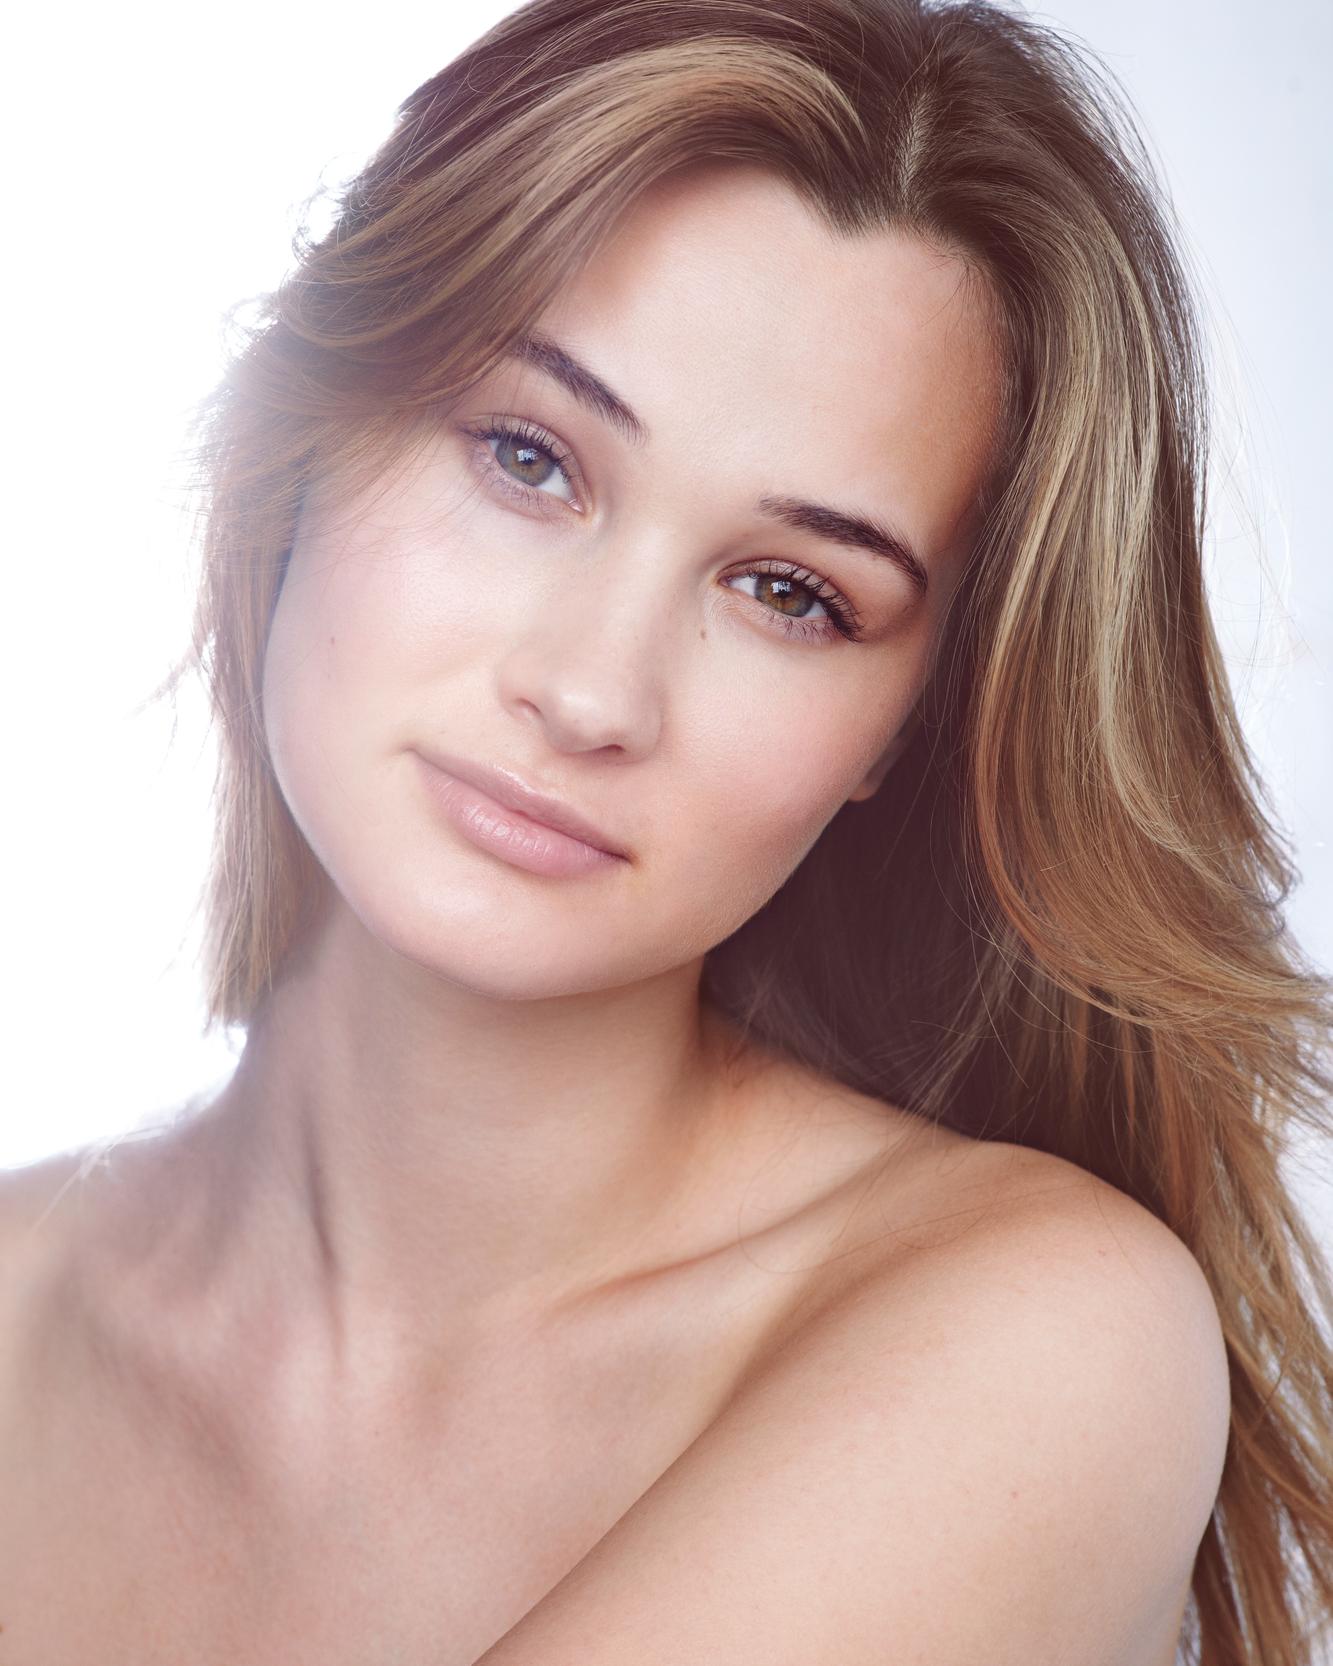 beauty-sensitive-skin-mbd108992.jpg